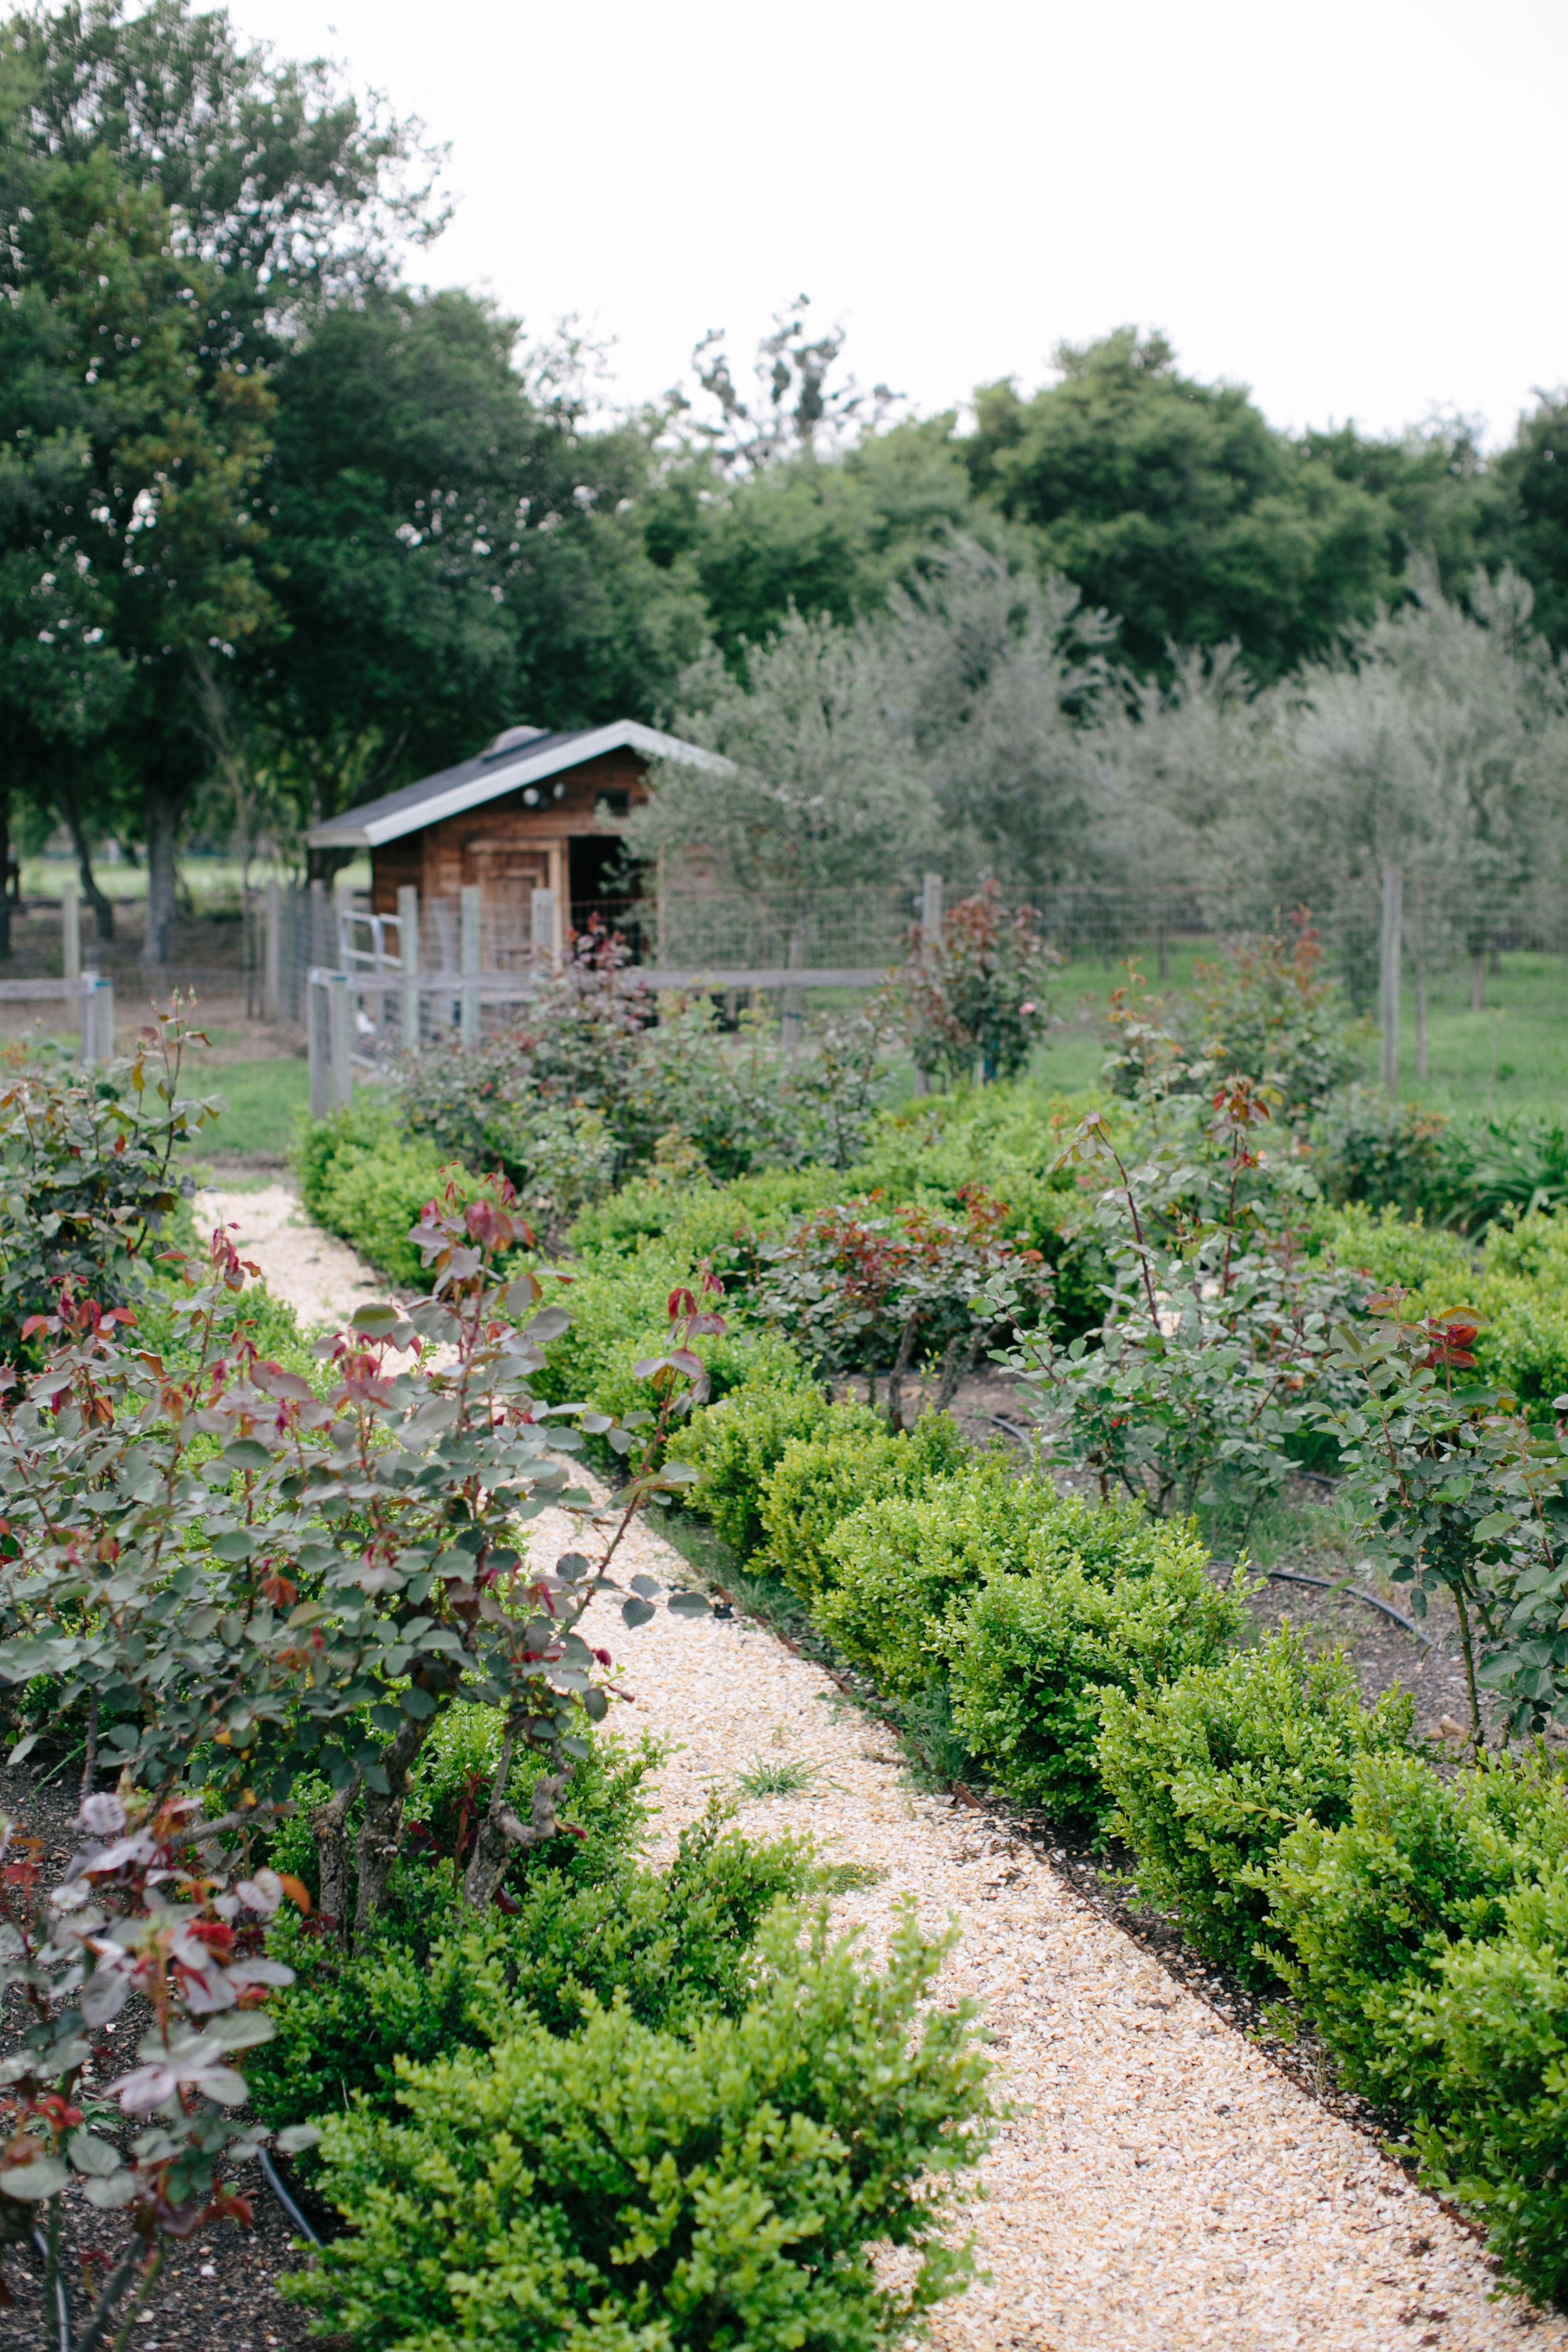 The Rose Gardens of Gore Farms